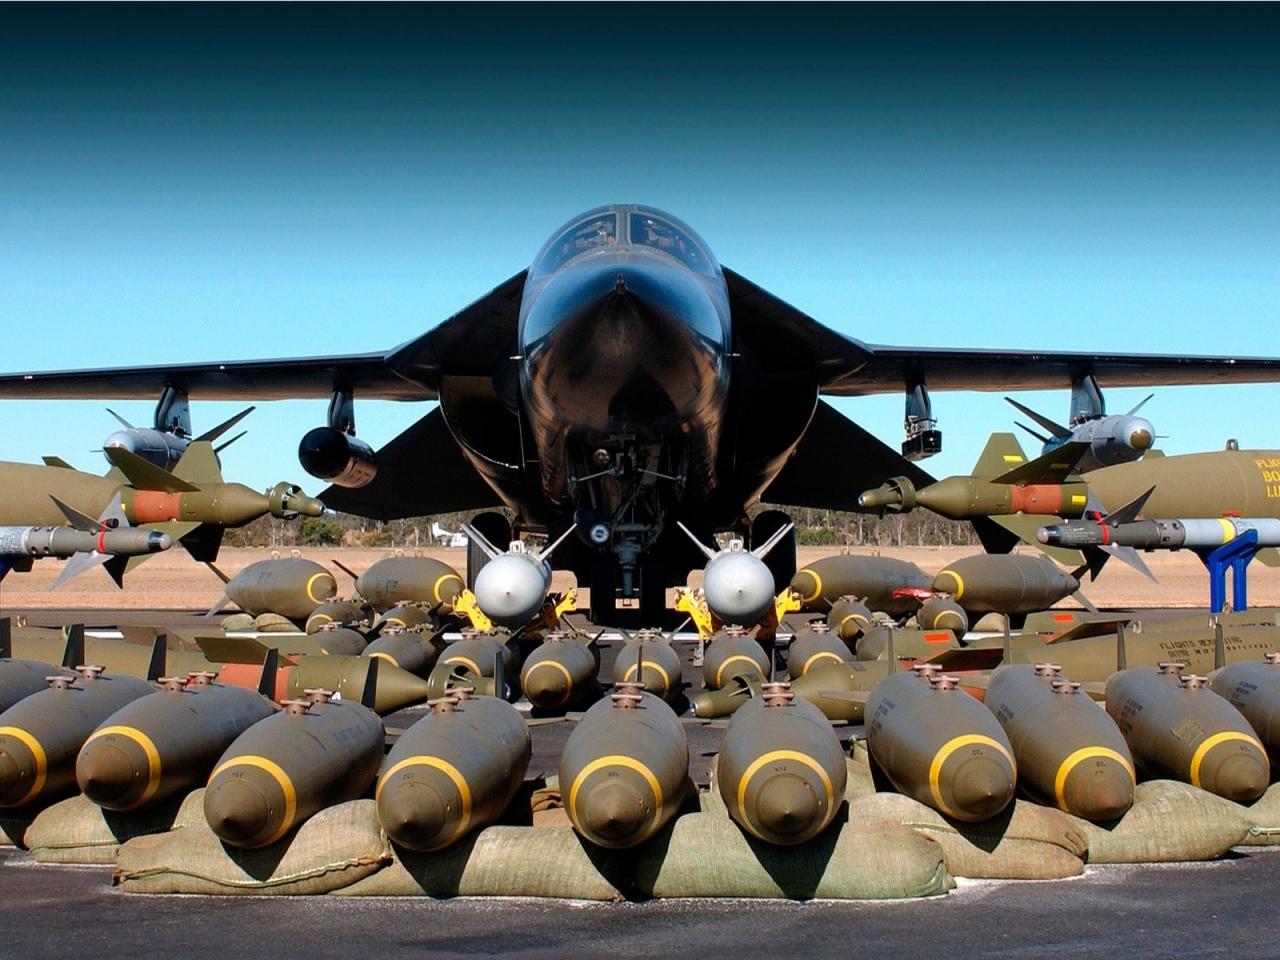 Avión bombardero - 1280x960